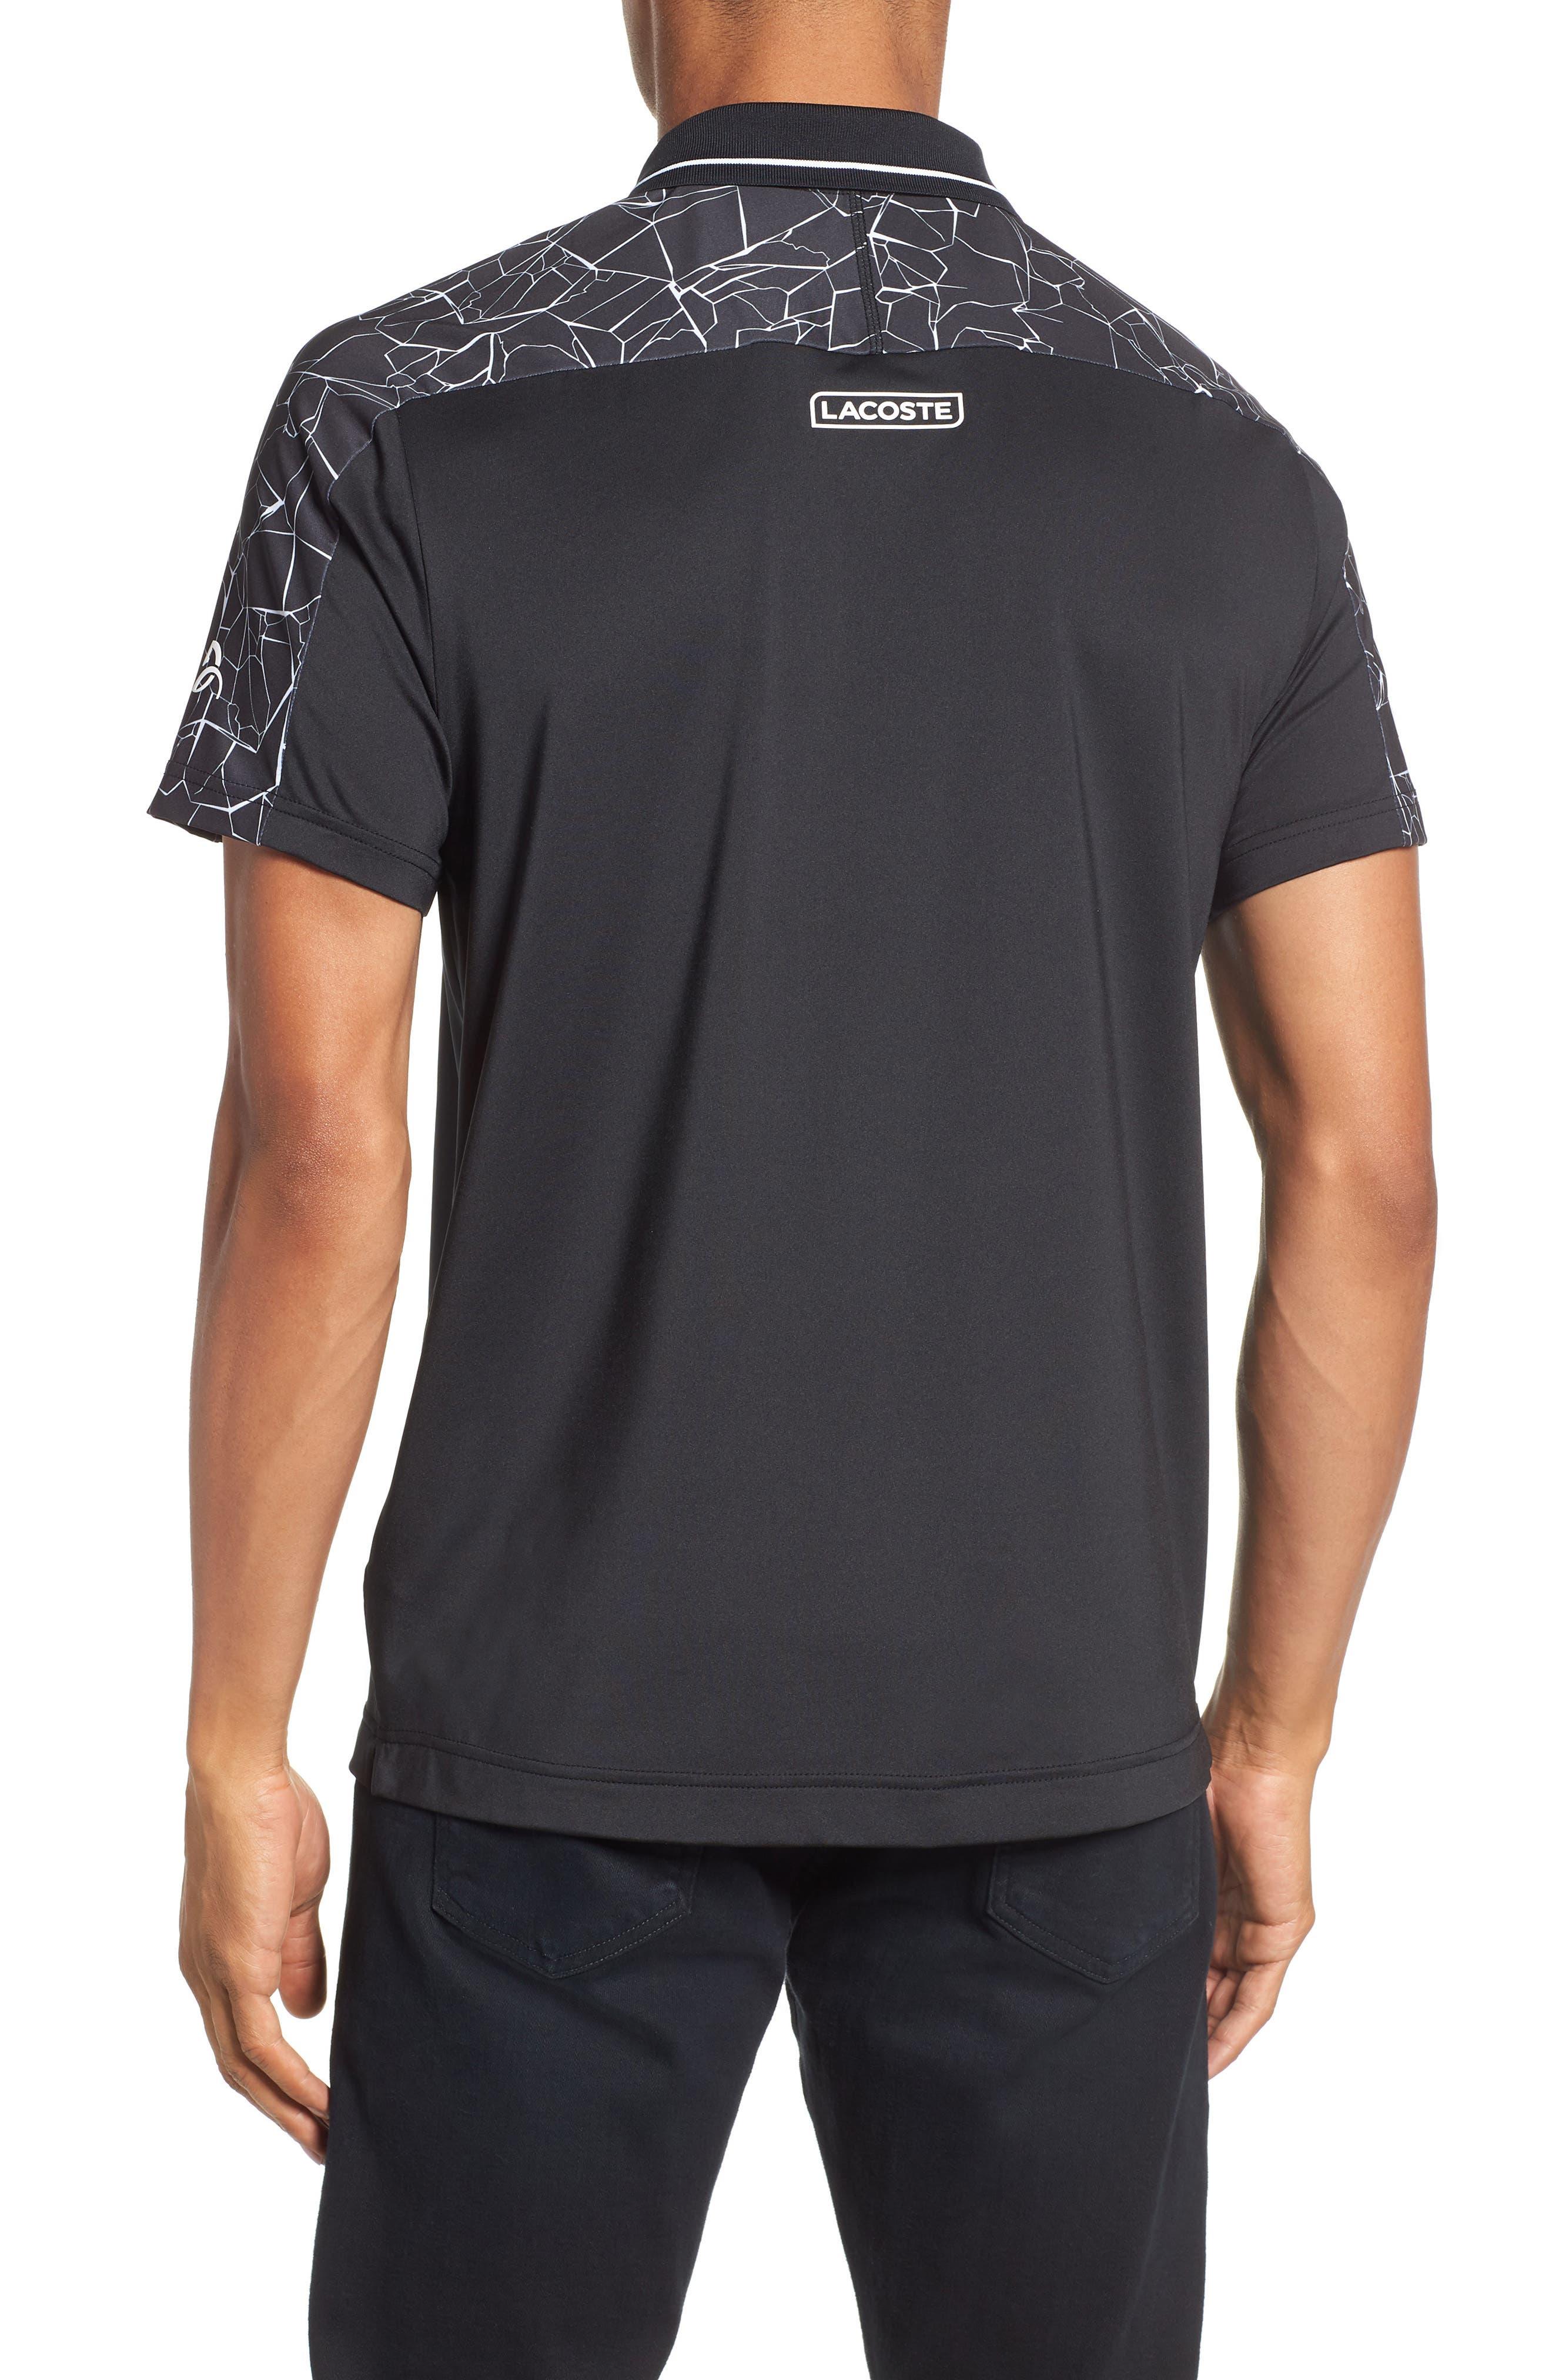 Regular Fit Novak Djokovic Ultra Dry Polo,                             Alternate thumbnail 2, color,                             003